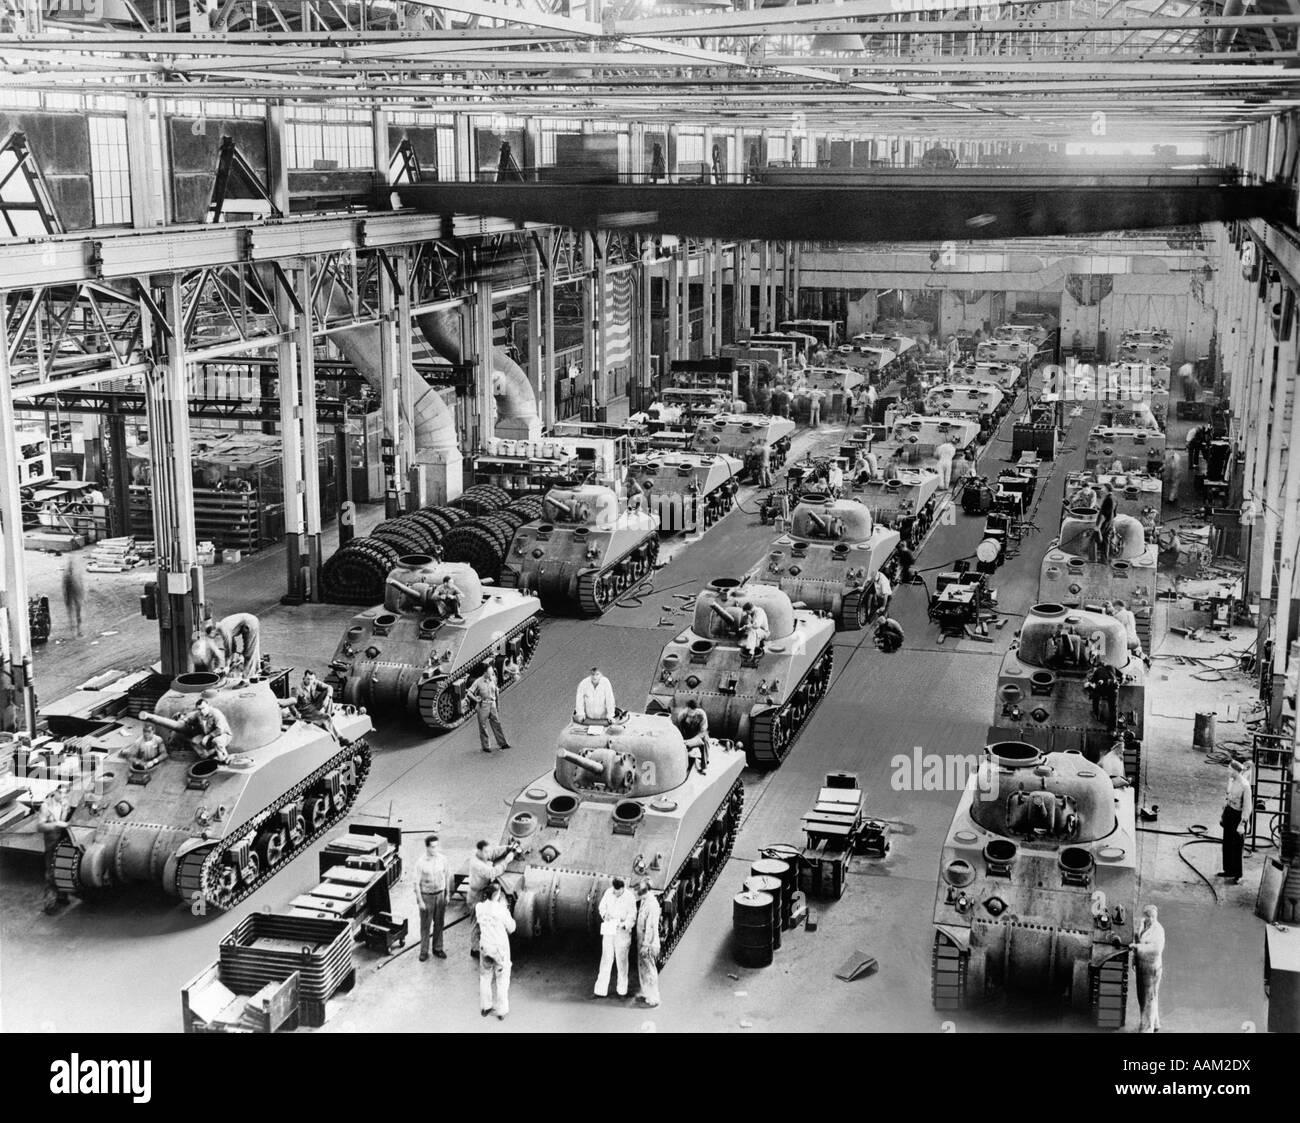 1940s GENERAL SHERMAN TANKS IN PRODUCTION CHRYSLER